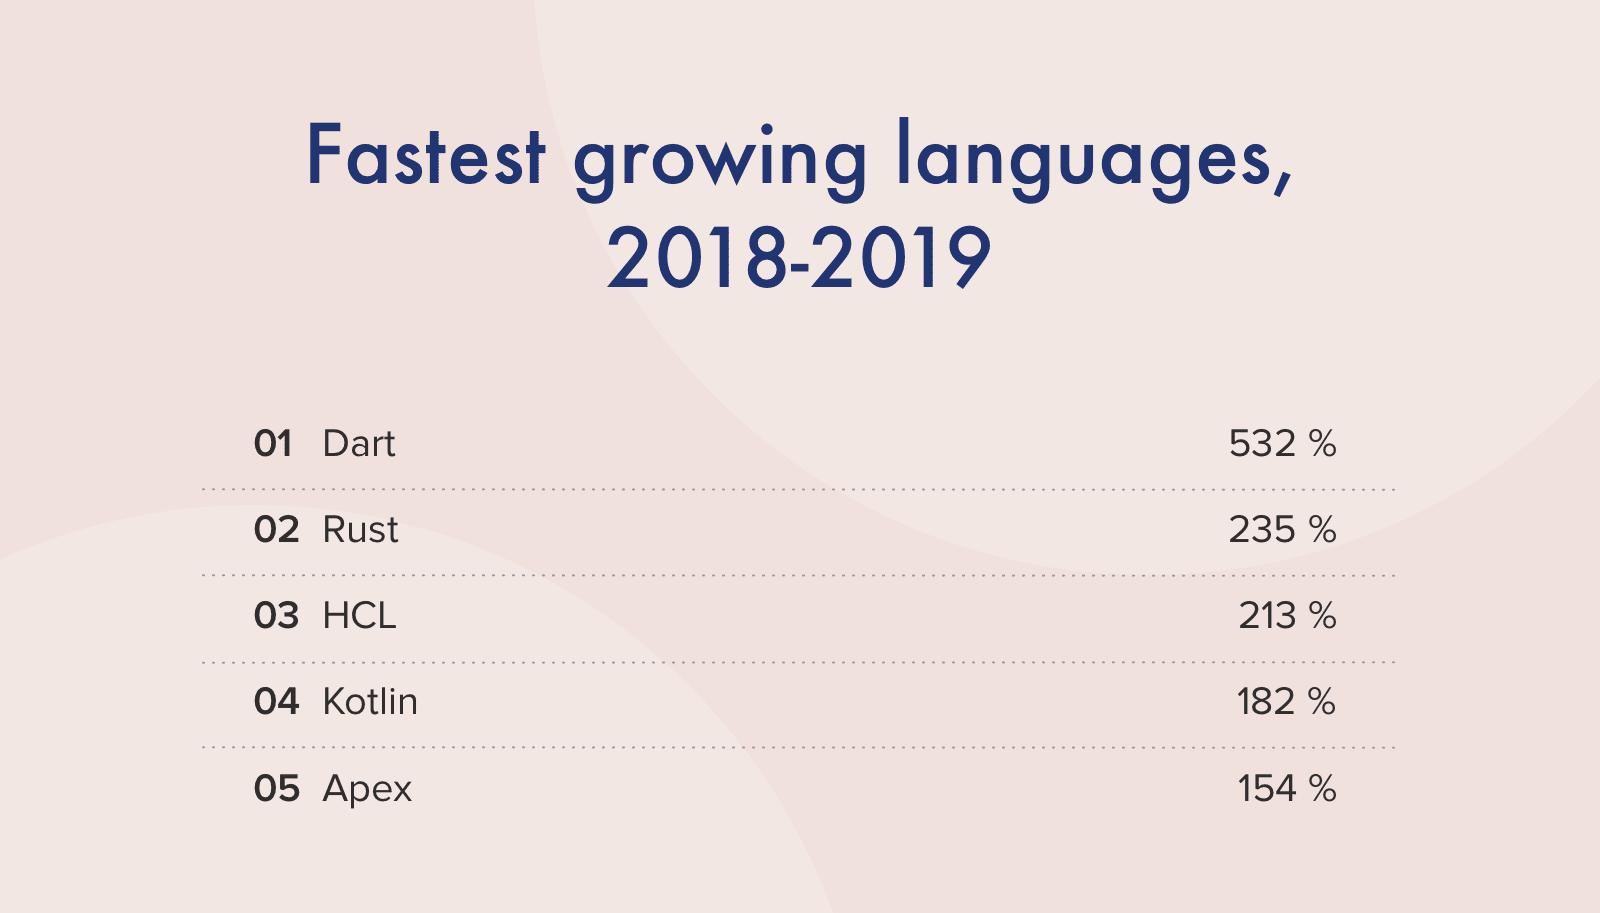 Top 5 Fastest Growing Programming Languages Ranking